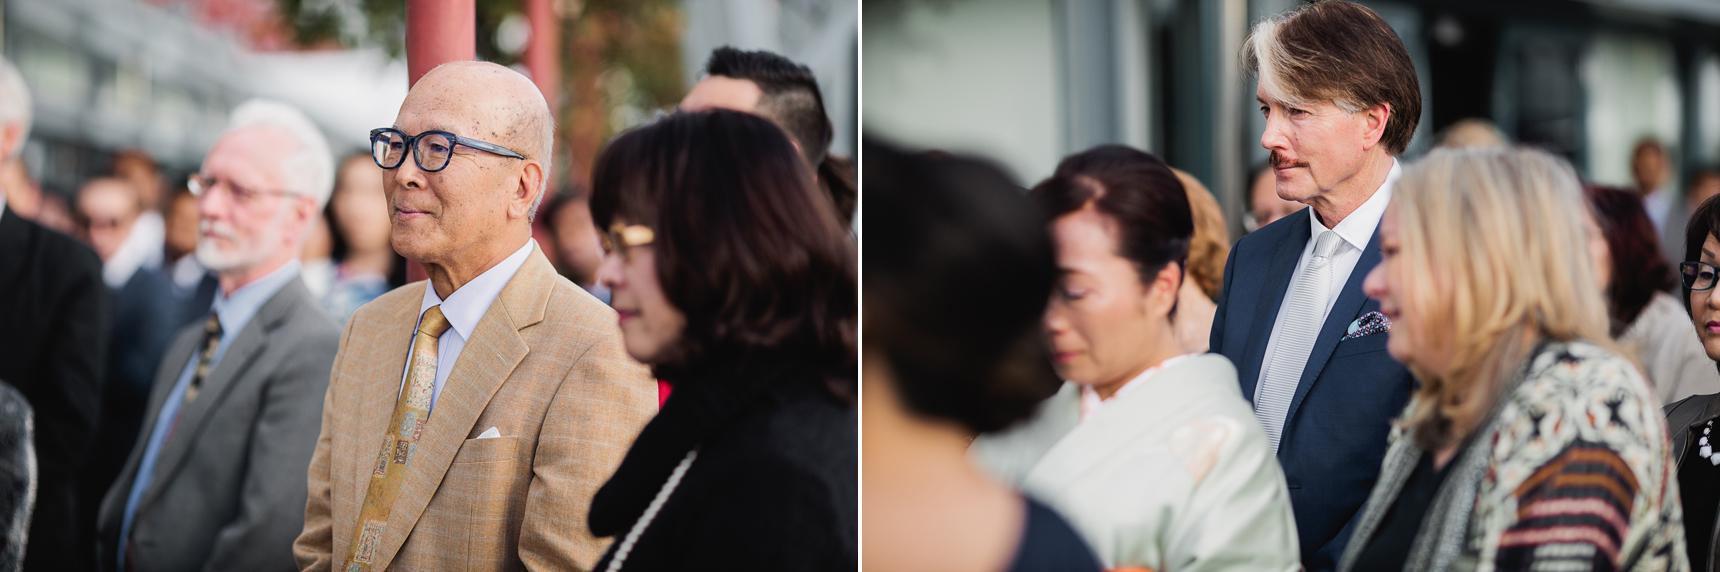 MJ_Pier_One_Sydney_Wedding_Photographer013.jpg